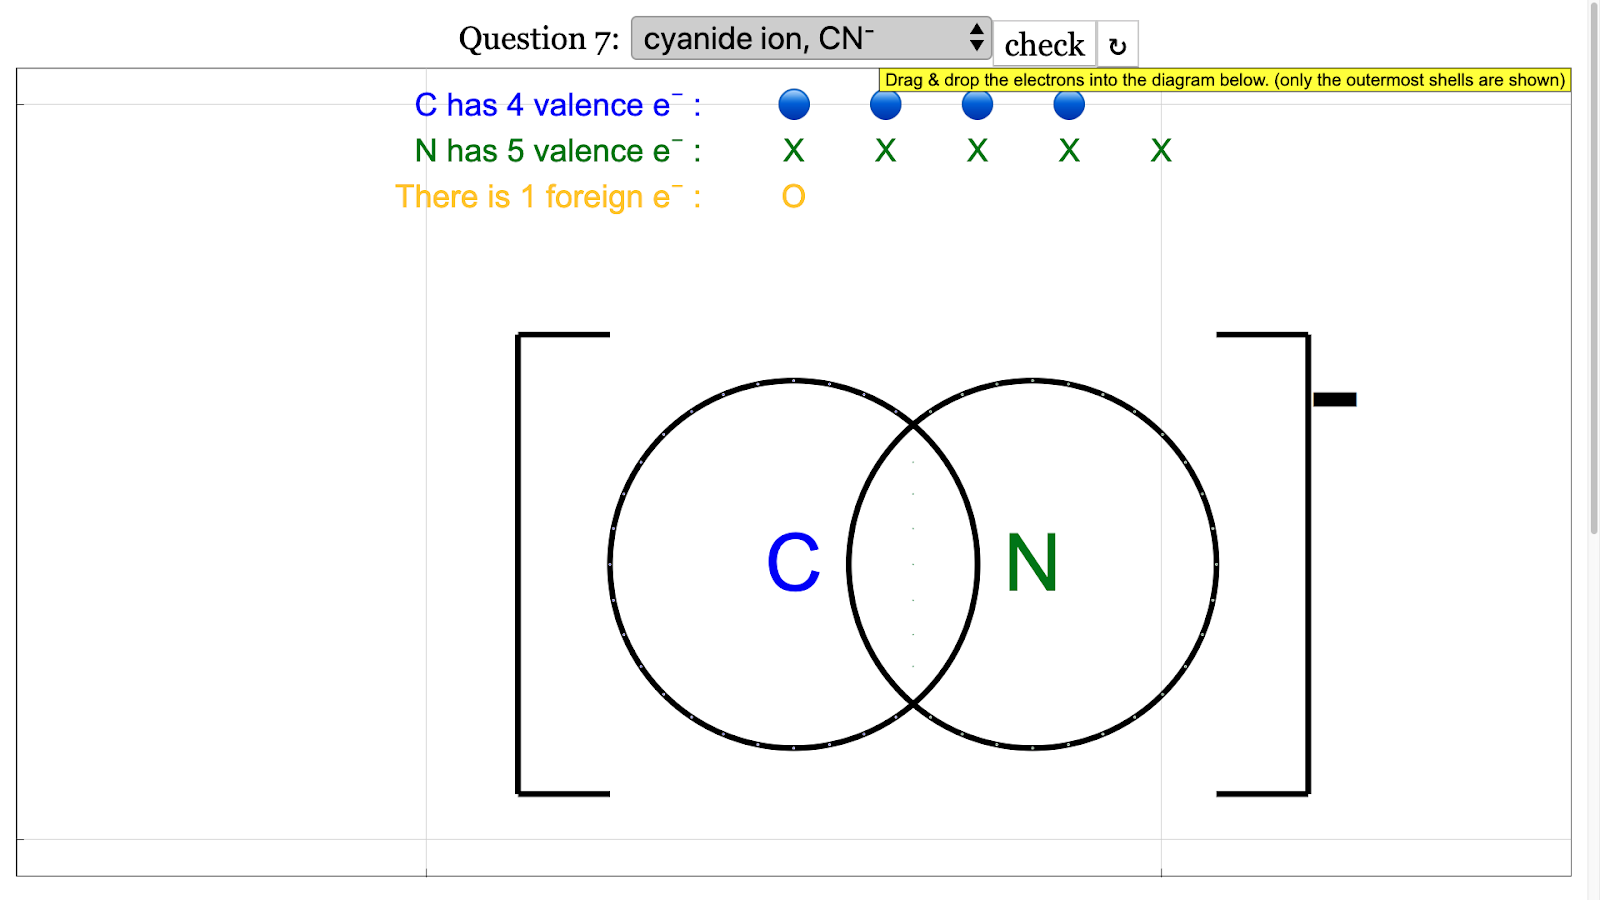 O Level Chemical Bonding Dot And Cross Diagrams Javascript Simulation Applet Html5